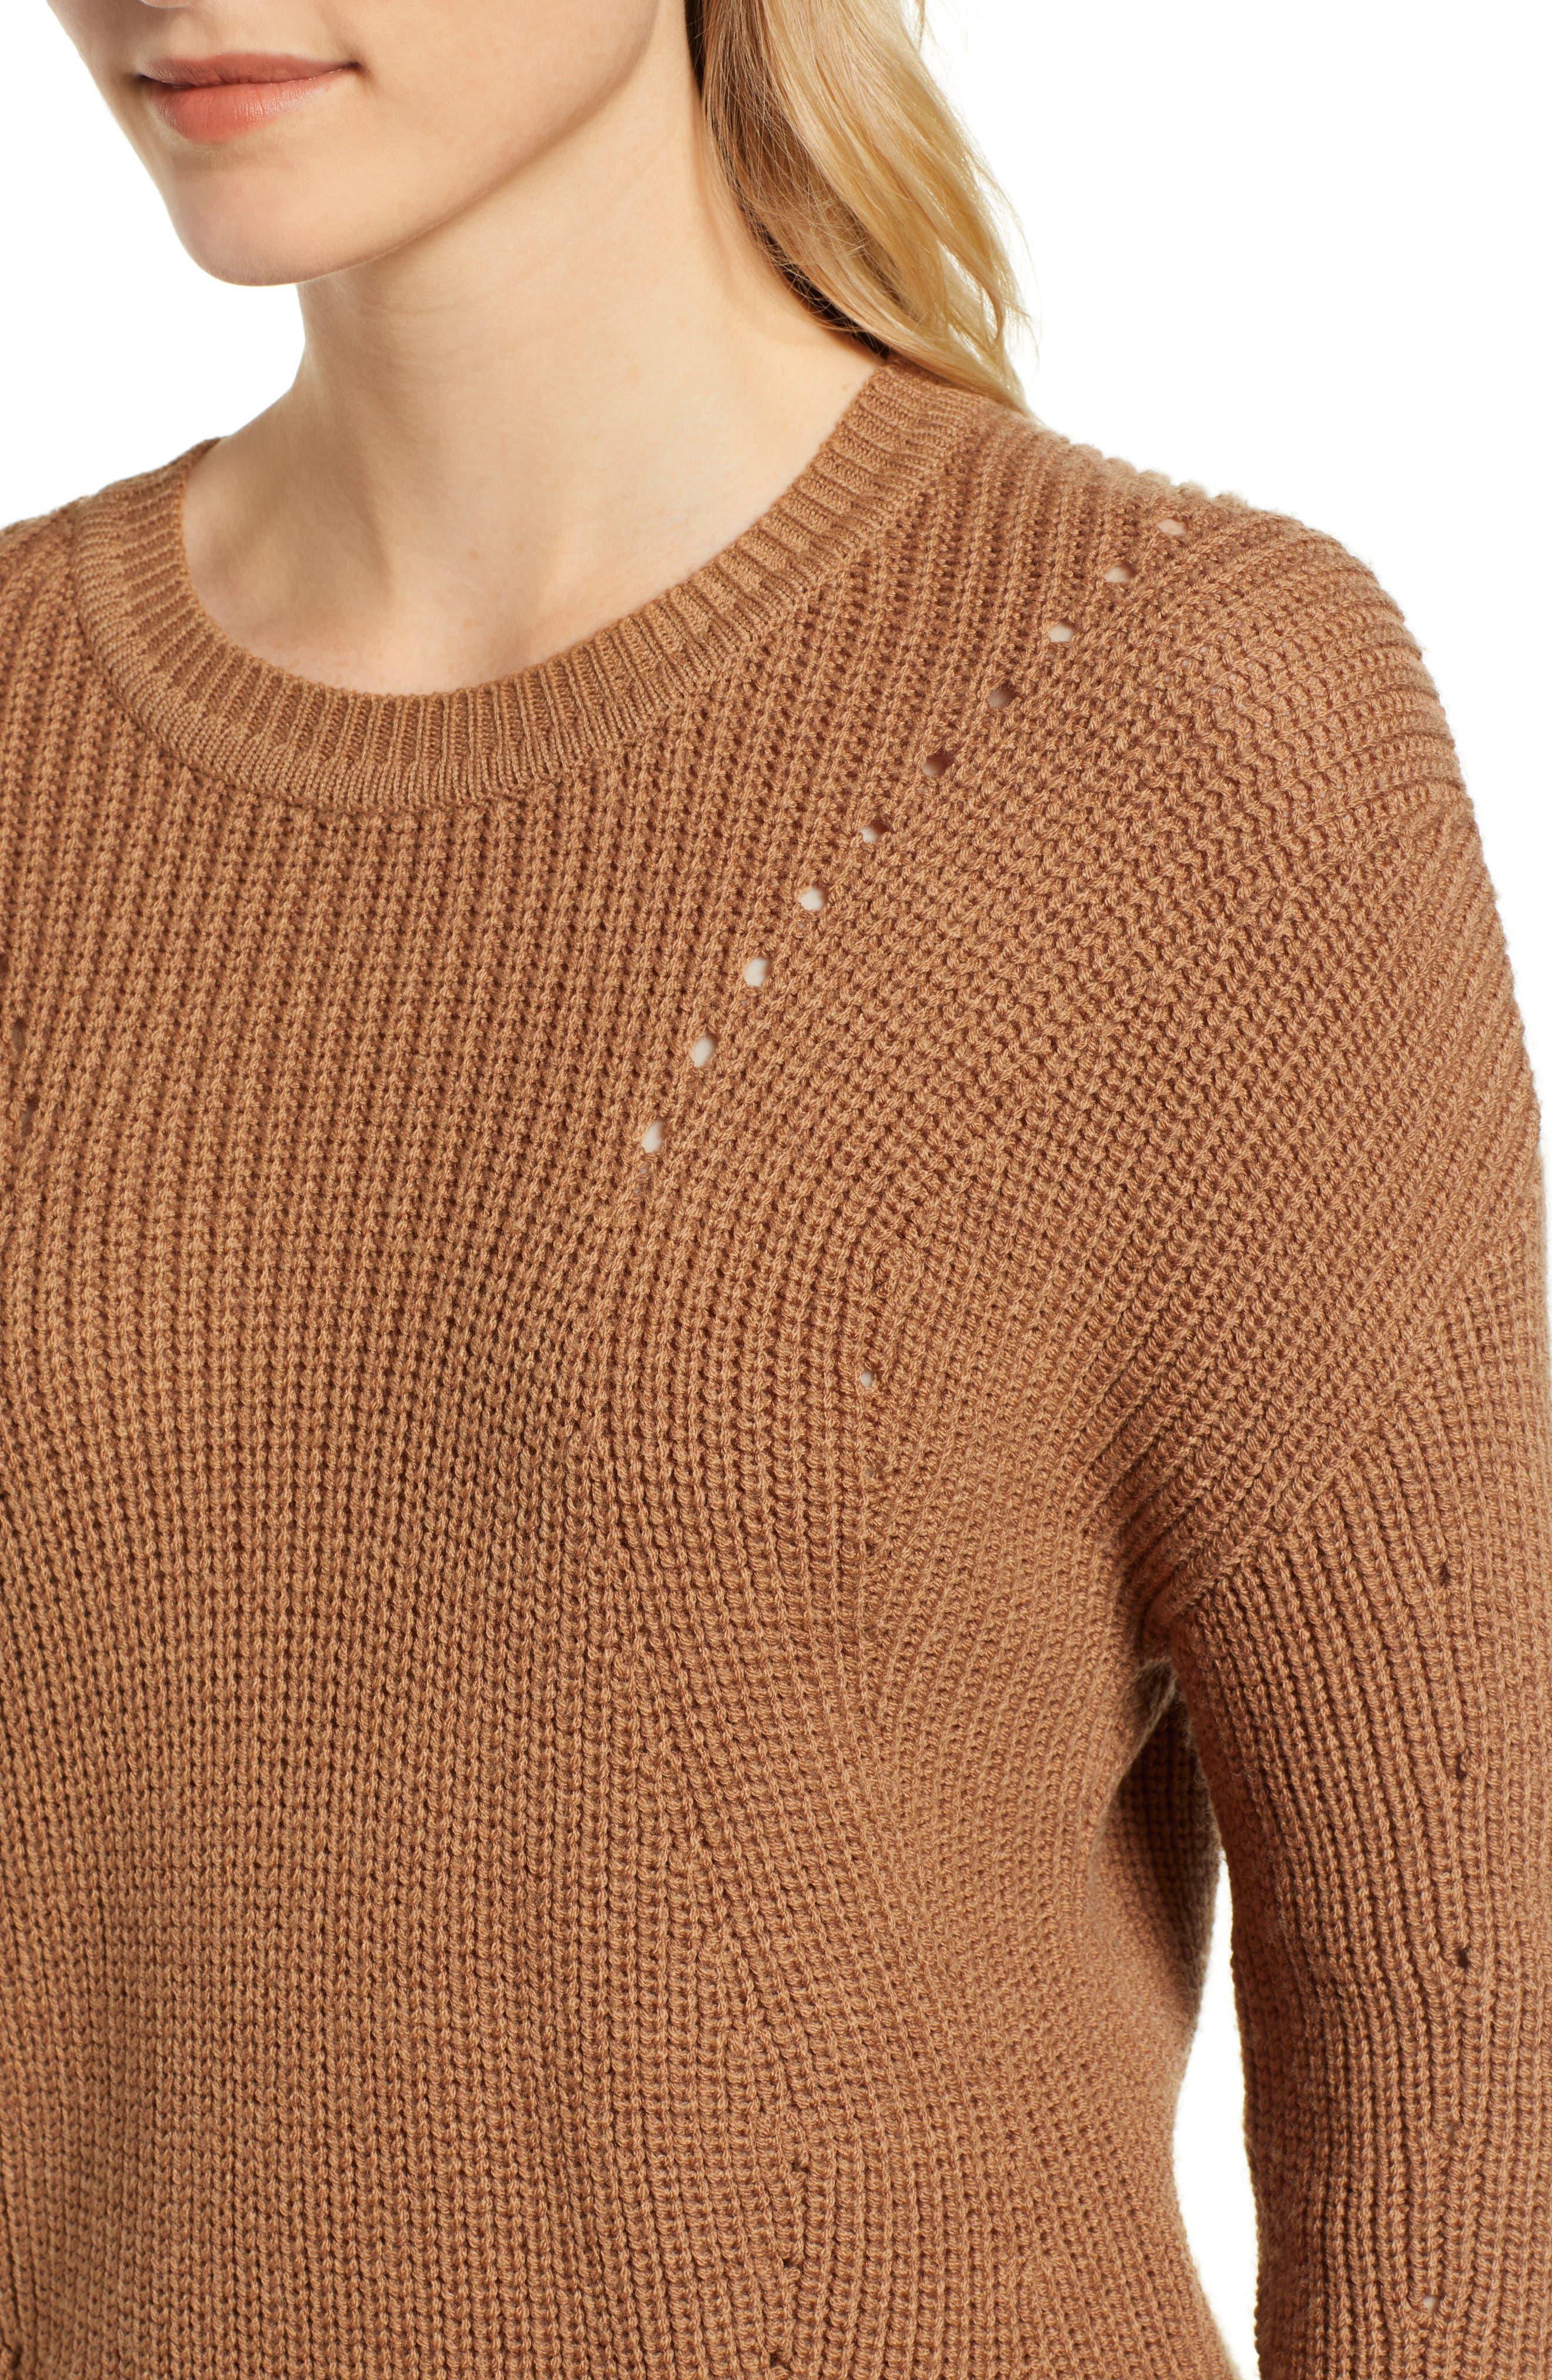 Crewneck Sweater,                             Alternate thumbnail 4, color,                             BRONZE